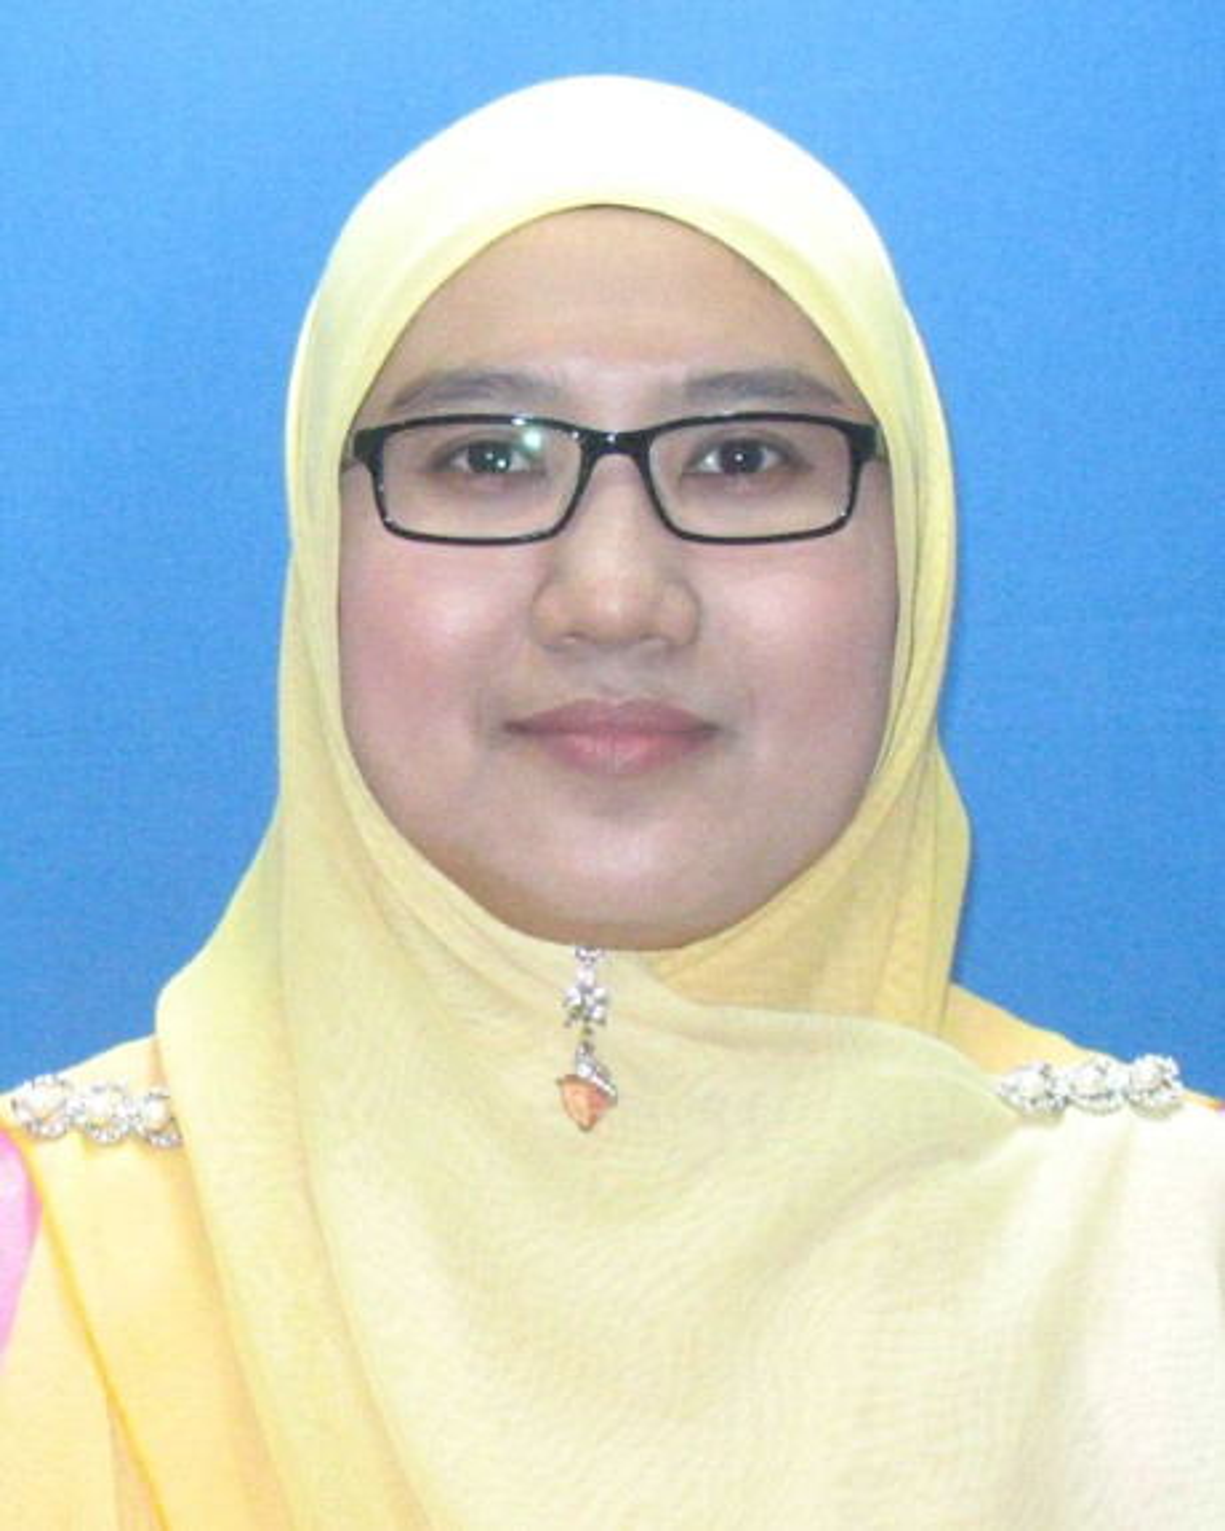 Nurusy Syahidah Binti Shamsudin